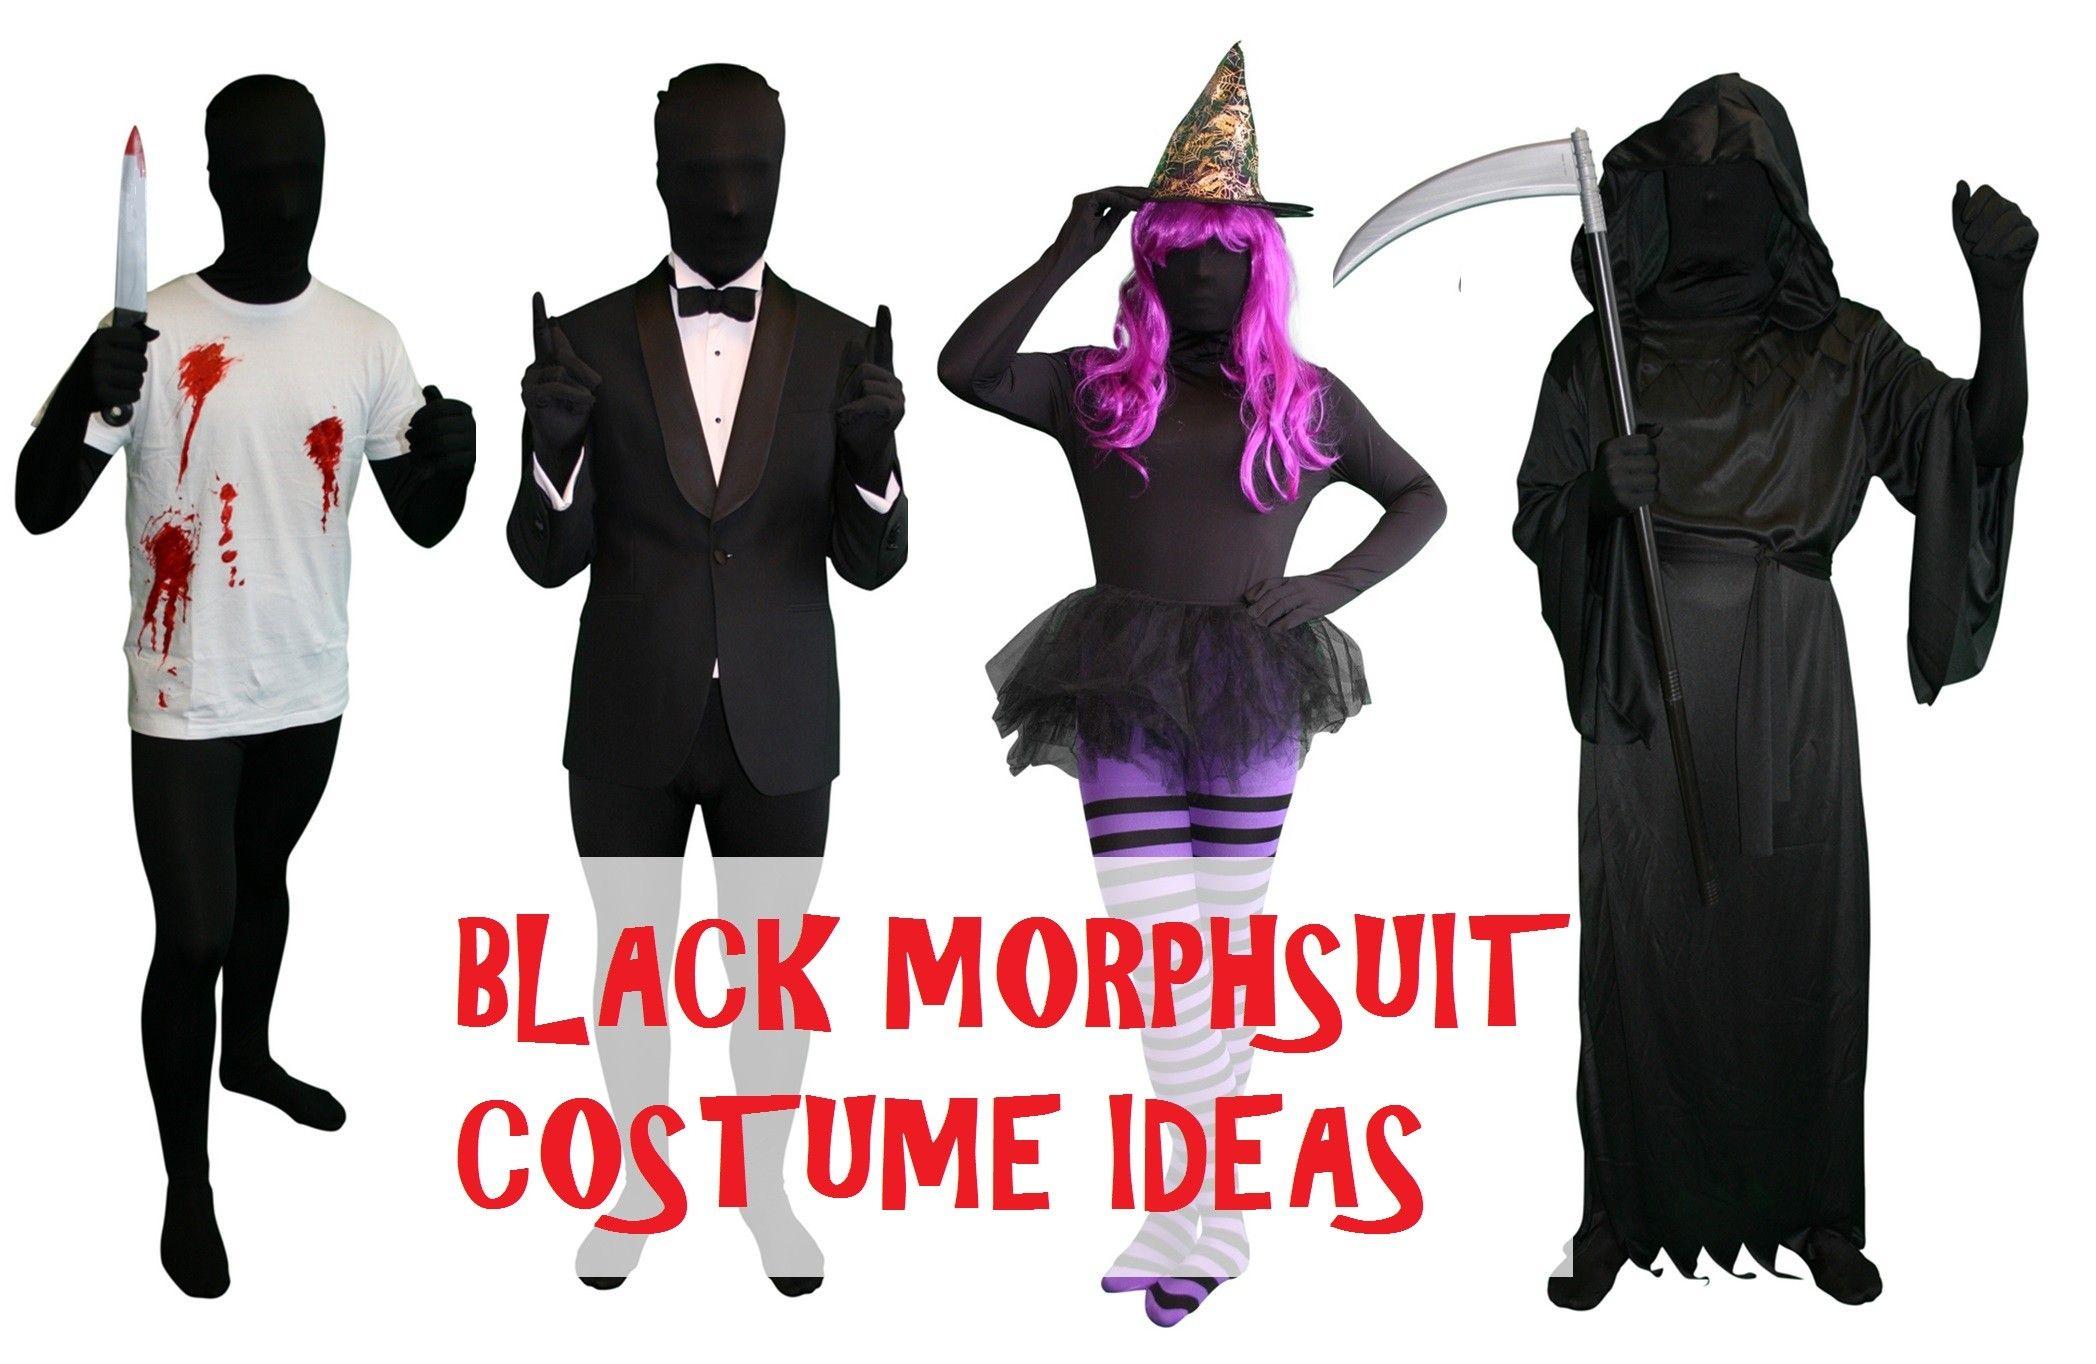 black morphsuit costume ideas for halloween - Morphsuits Halloween Costumes